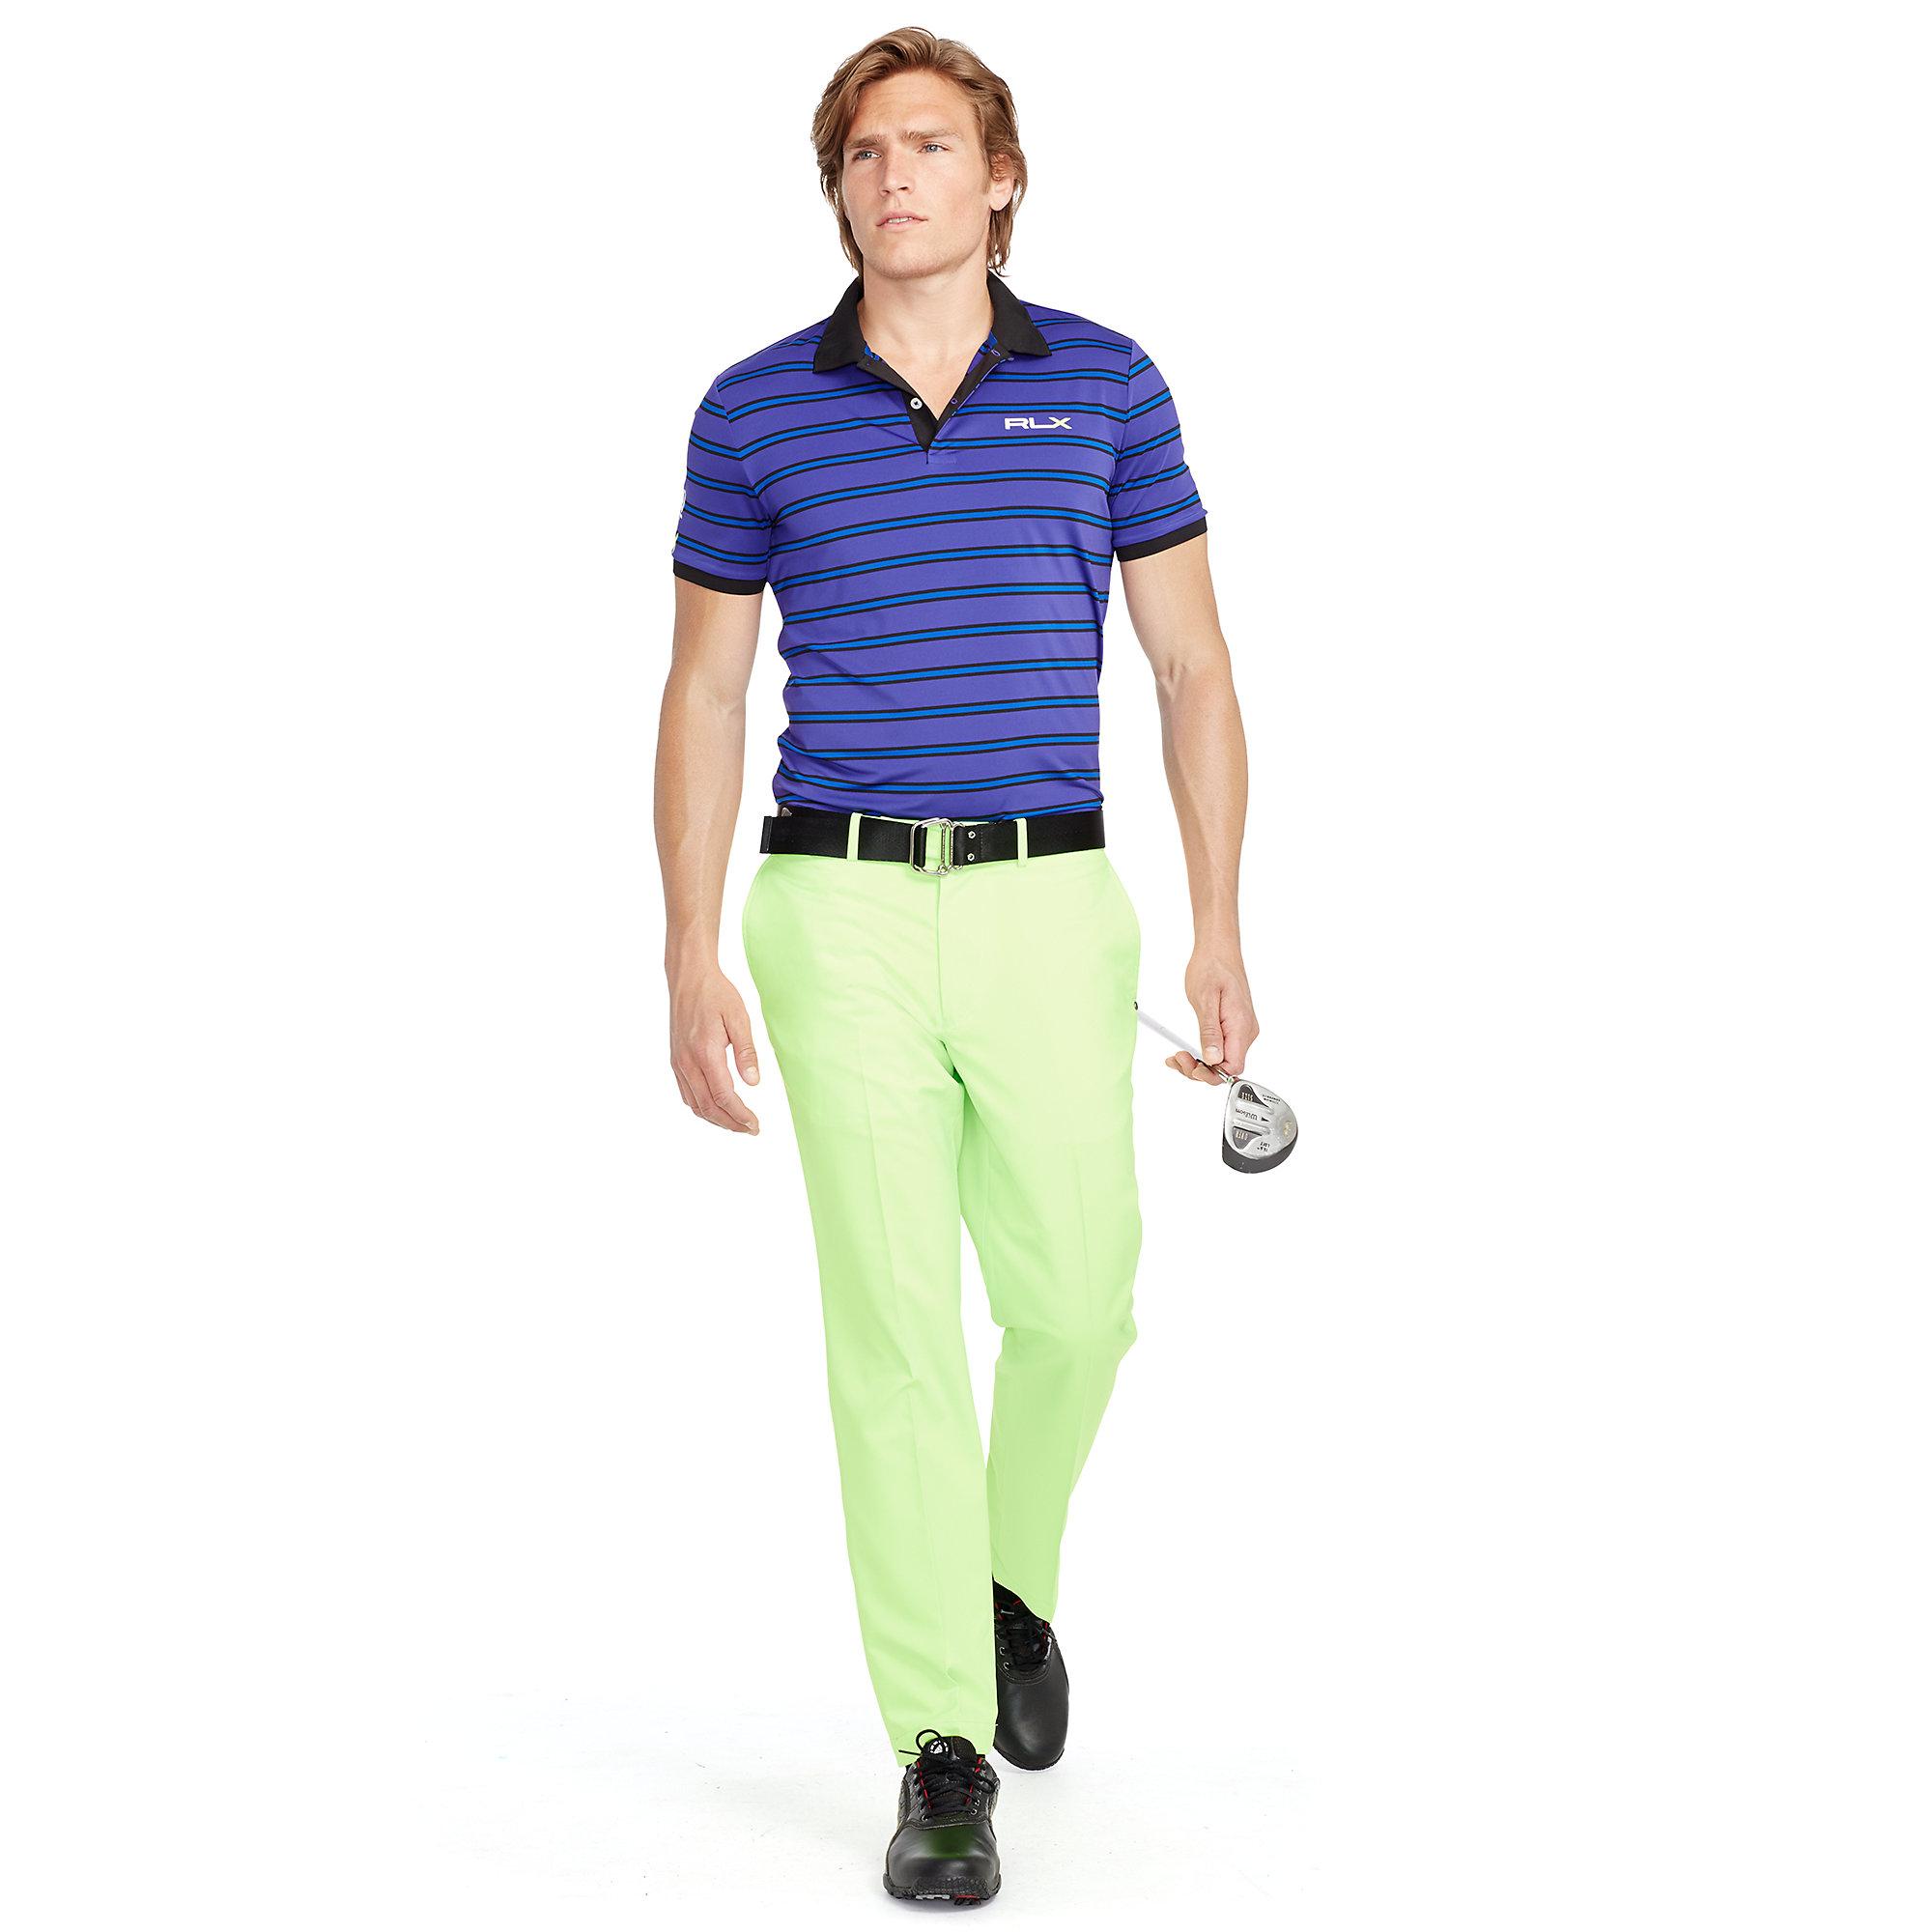 ralph lauren slim fit striped polo shirt in purple for men. Black Bedroom Furniture Sets. Home Design Ideas